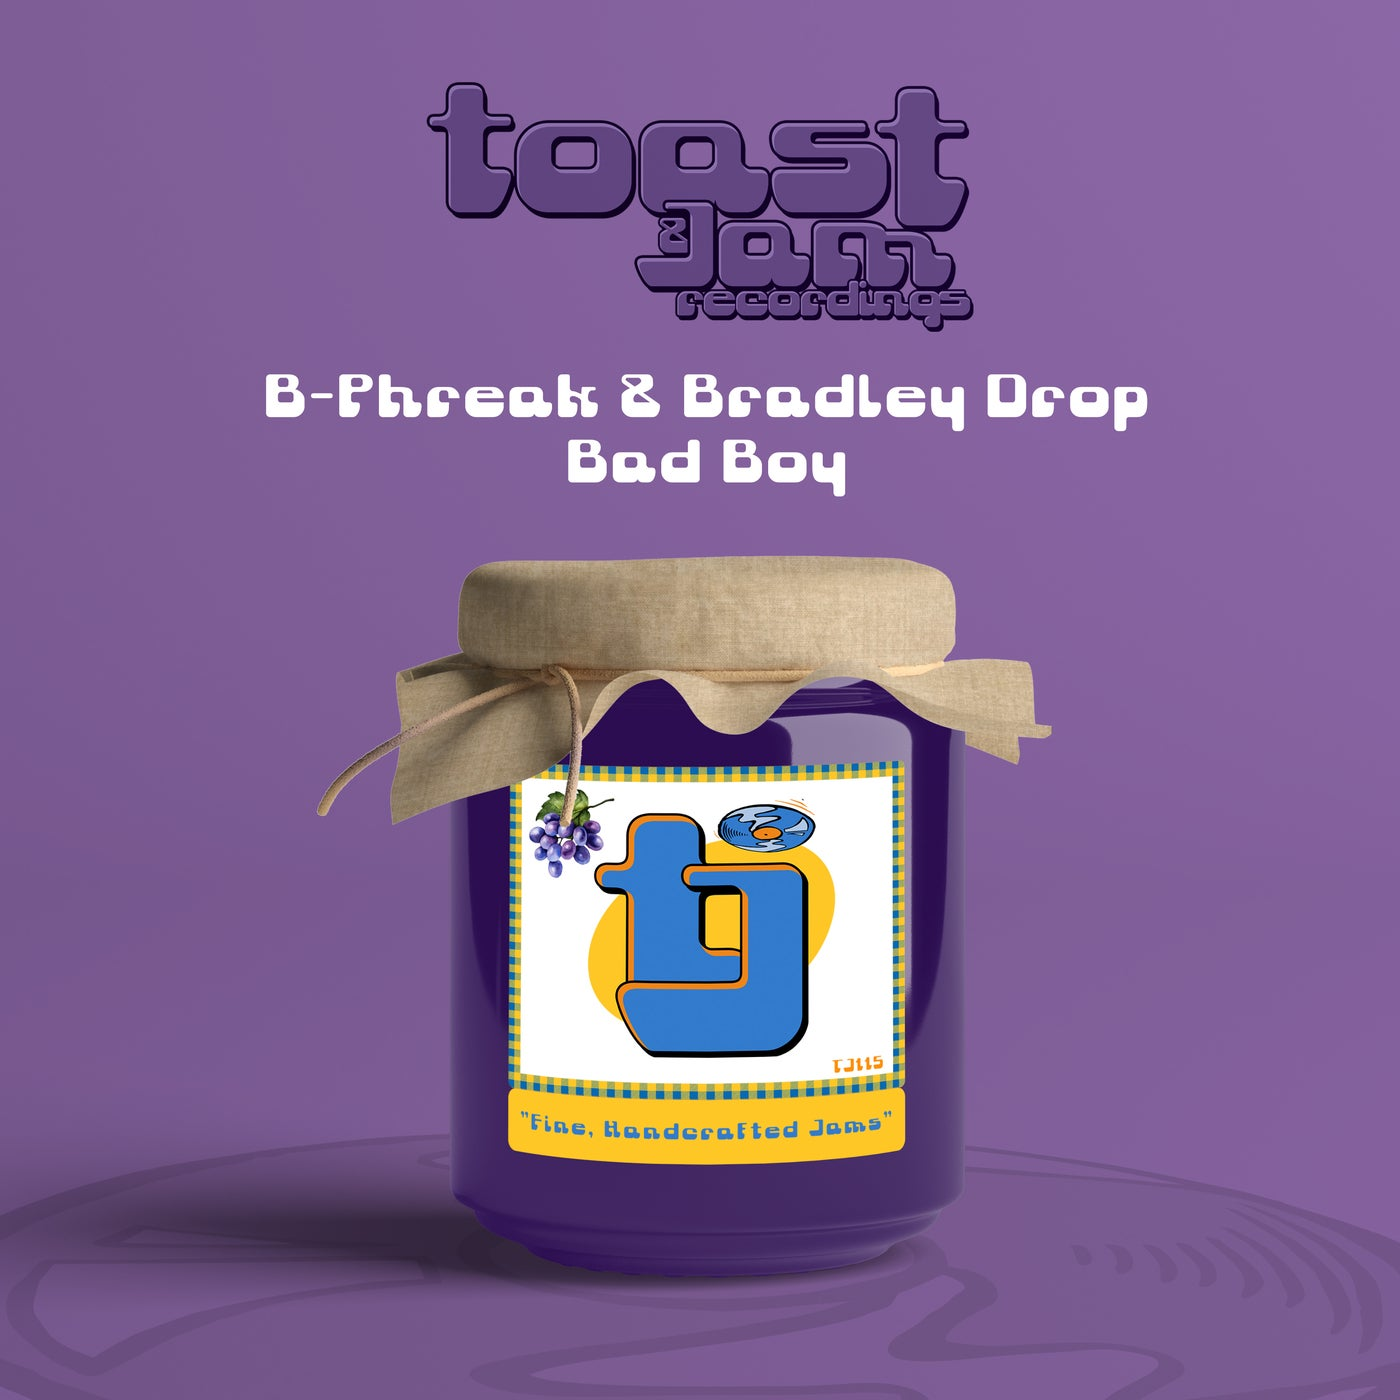 Bad Boy (Original Mix)